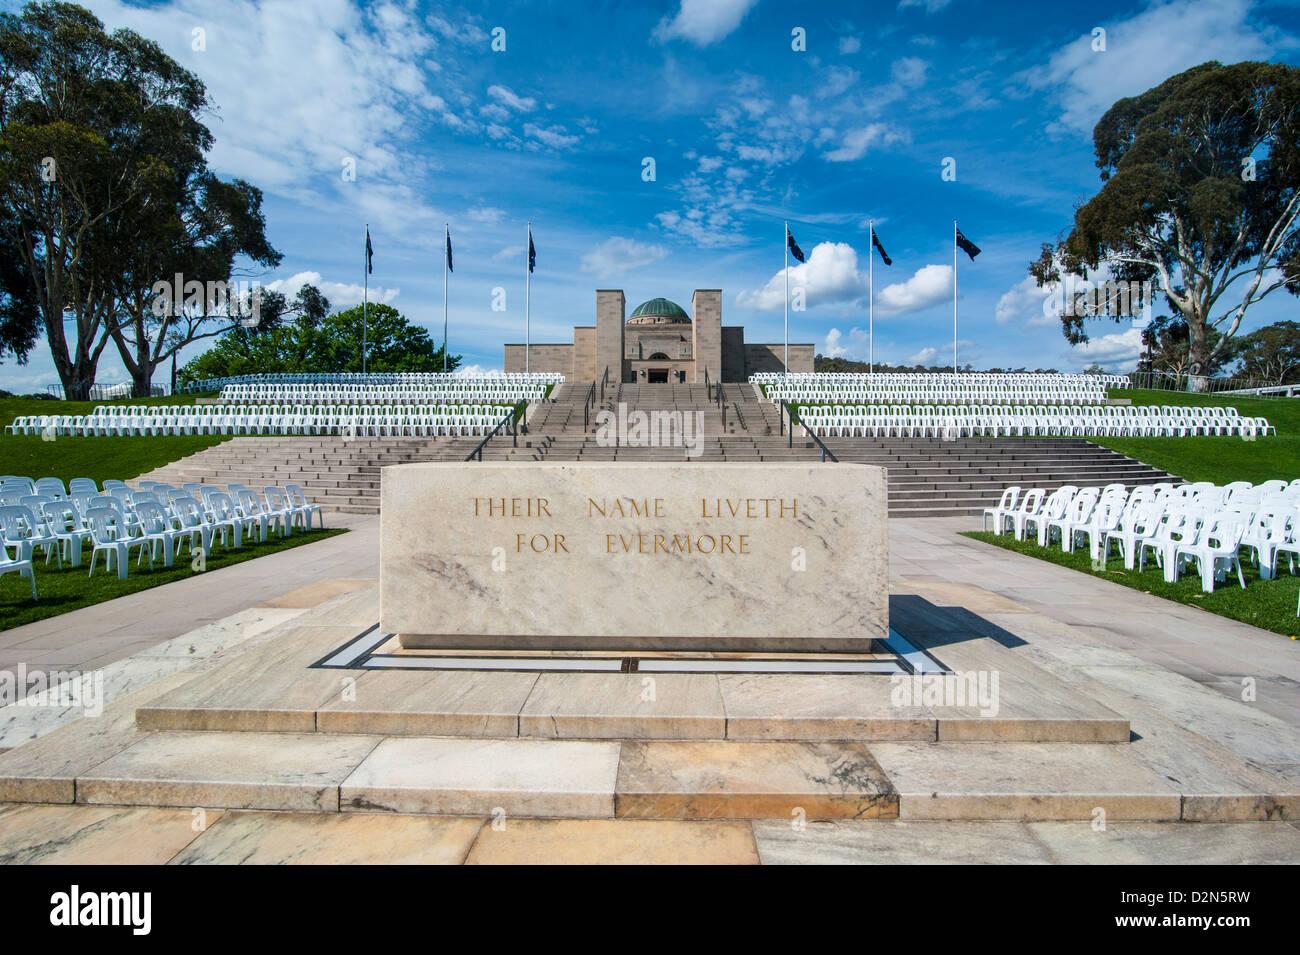 Australian War Memorial, Canberra, Australian Capital Territory, Australia, Pacific - Stock Image